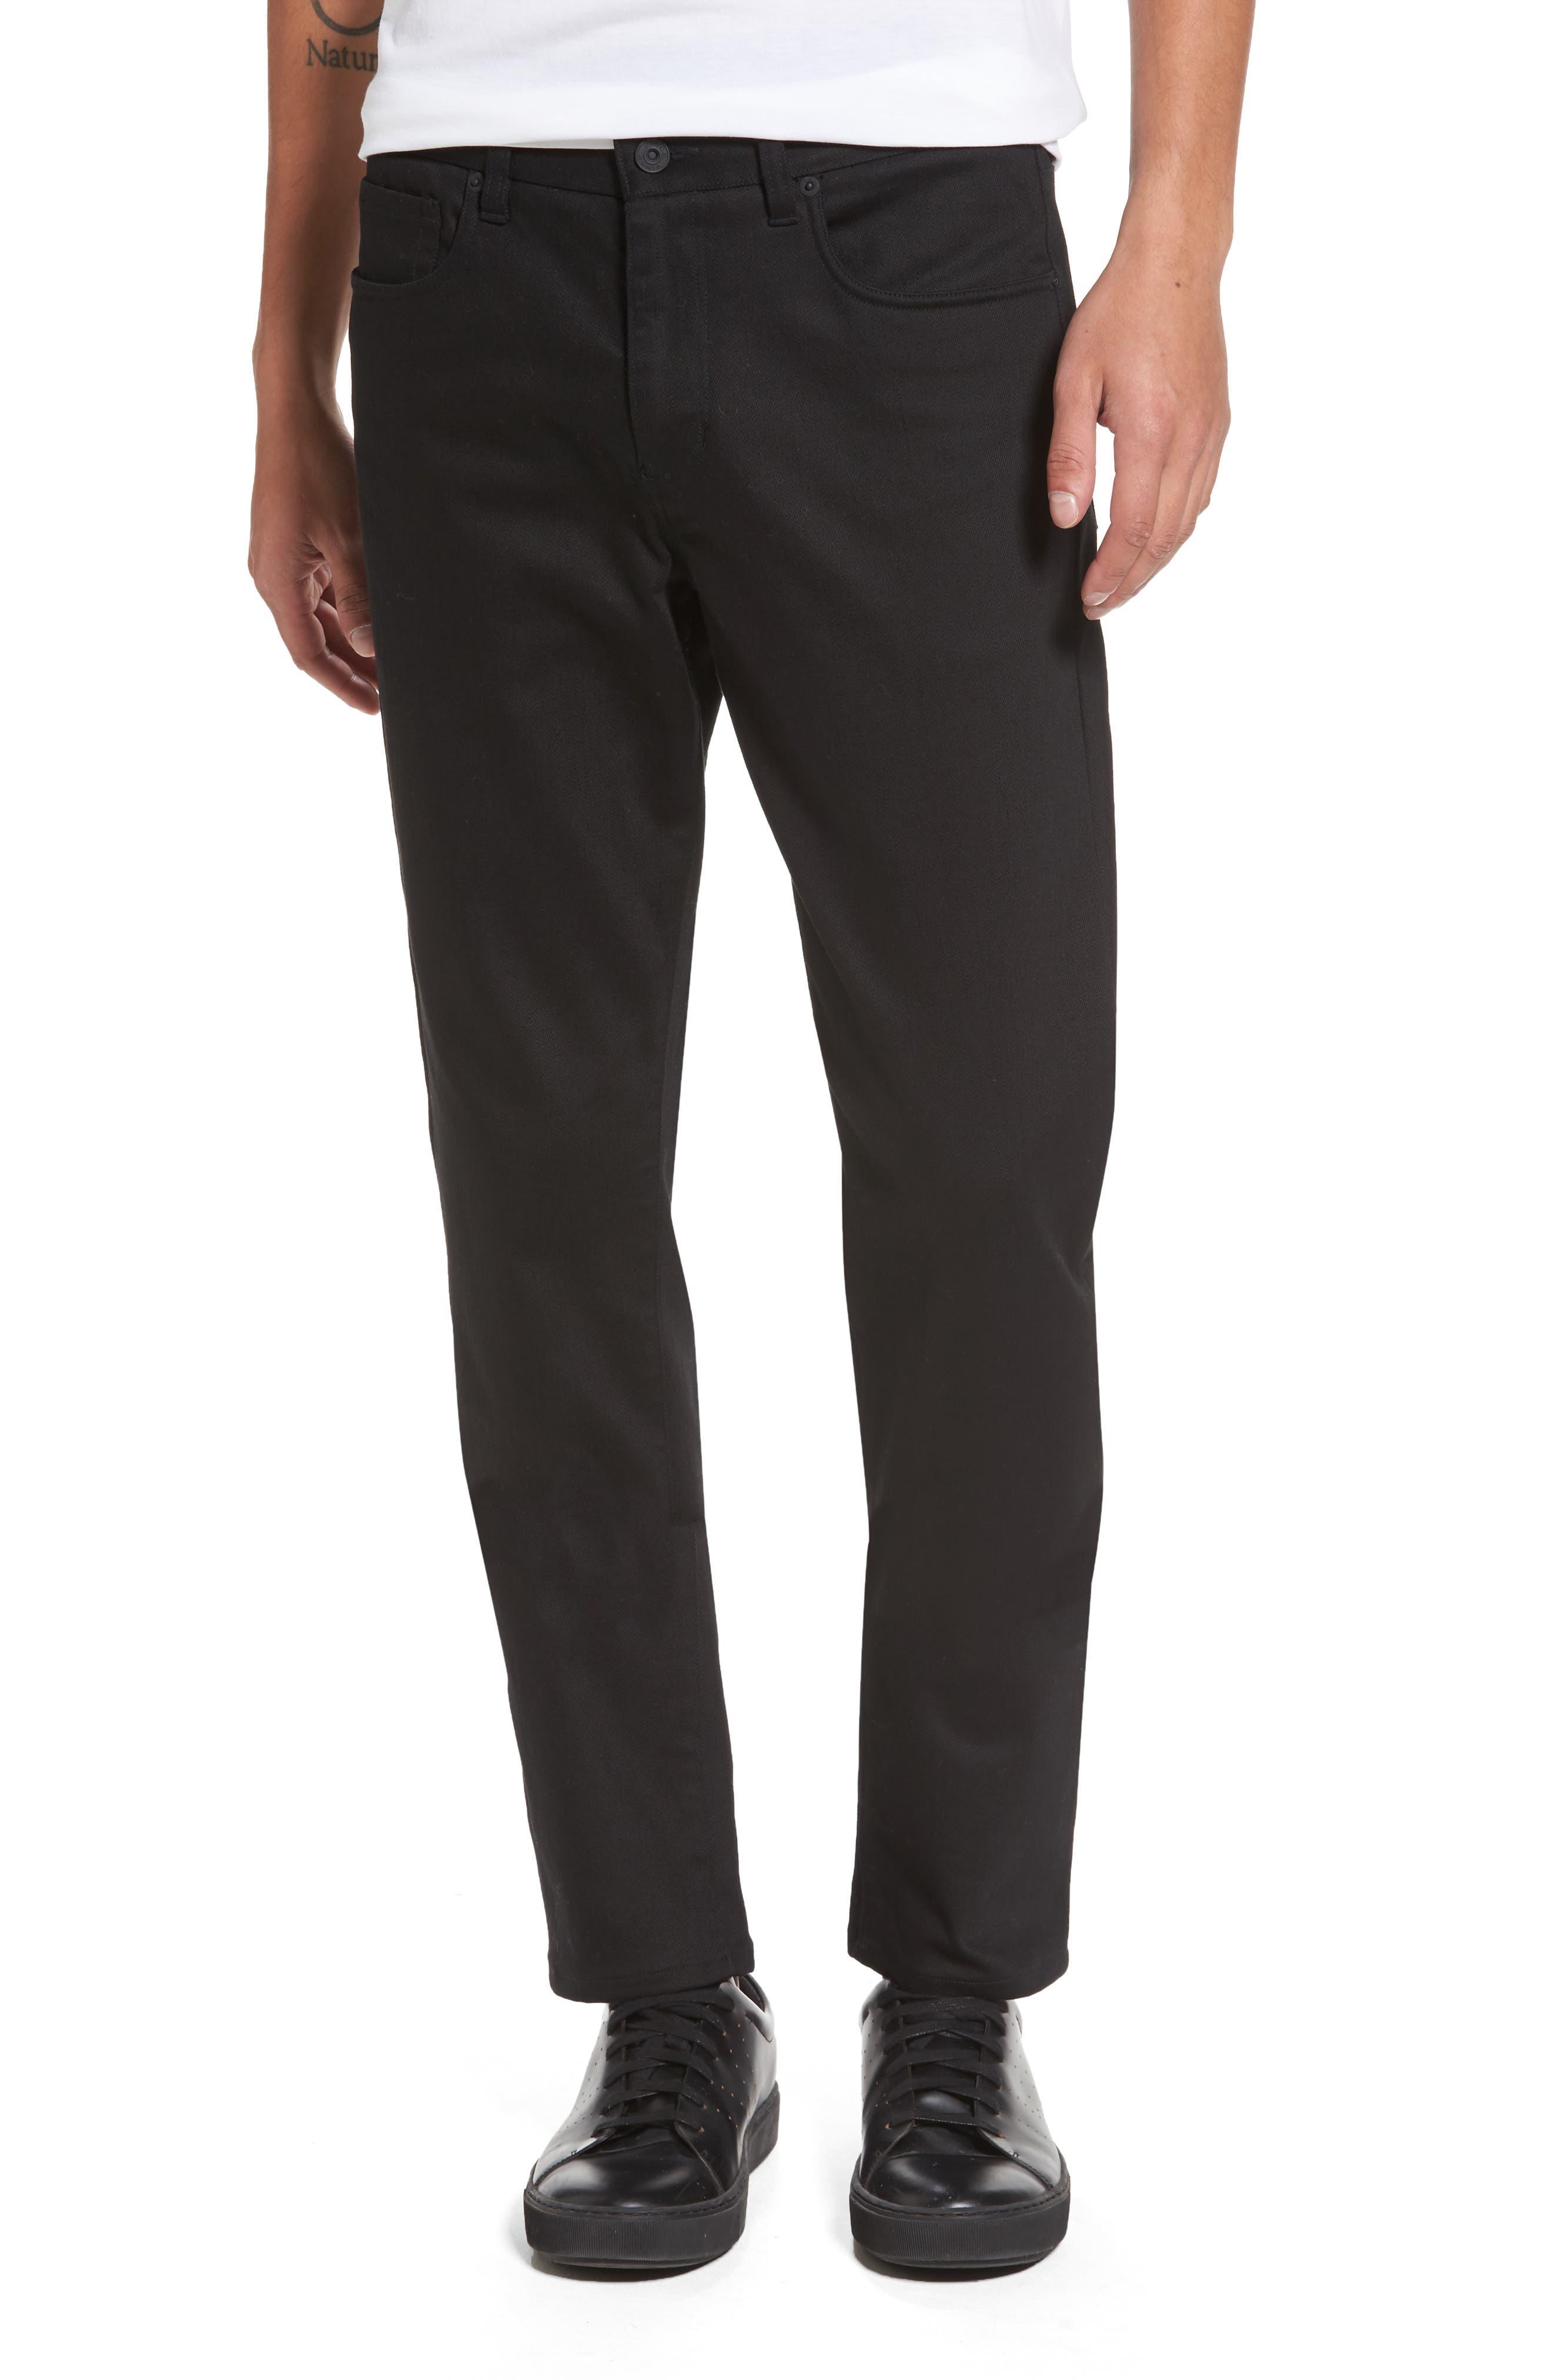 Alternate Image 1 Selected - Vince Stretch Twill 5-Pocket Pants